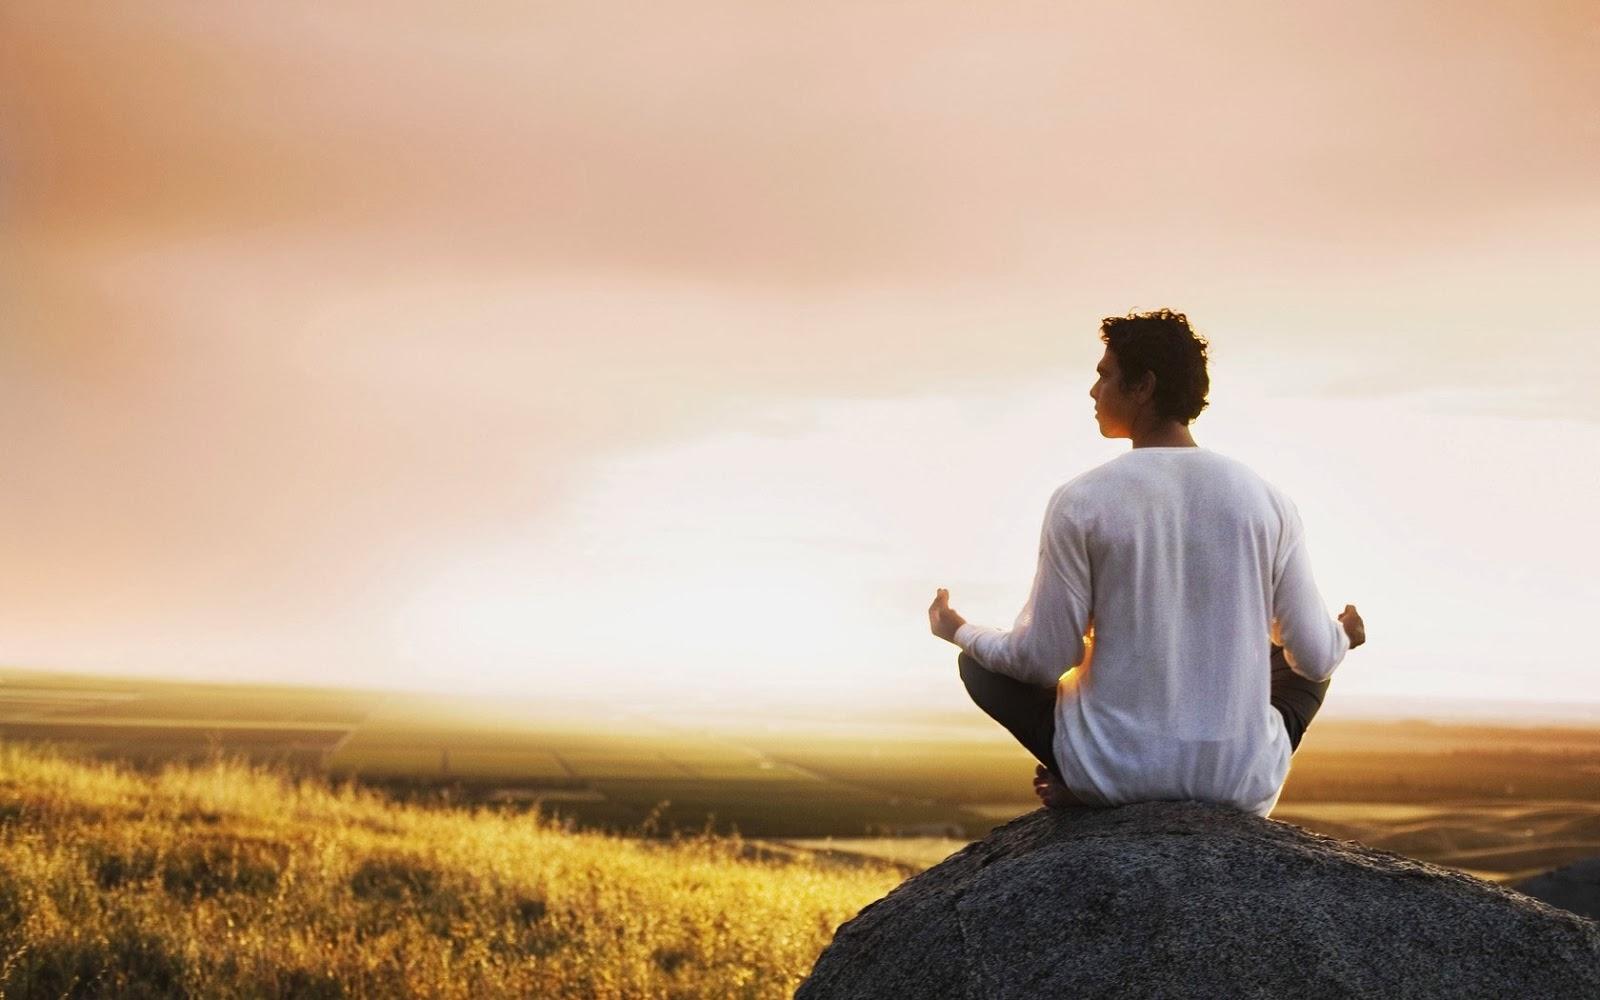 Diya Wallpaper Hd Meditation Hindu God Wallpapers Download